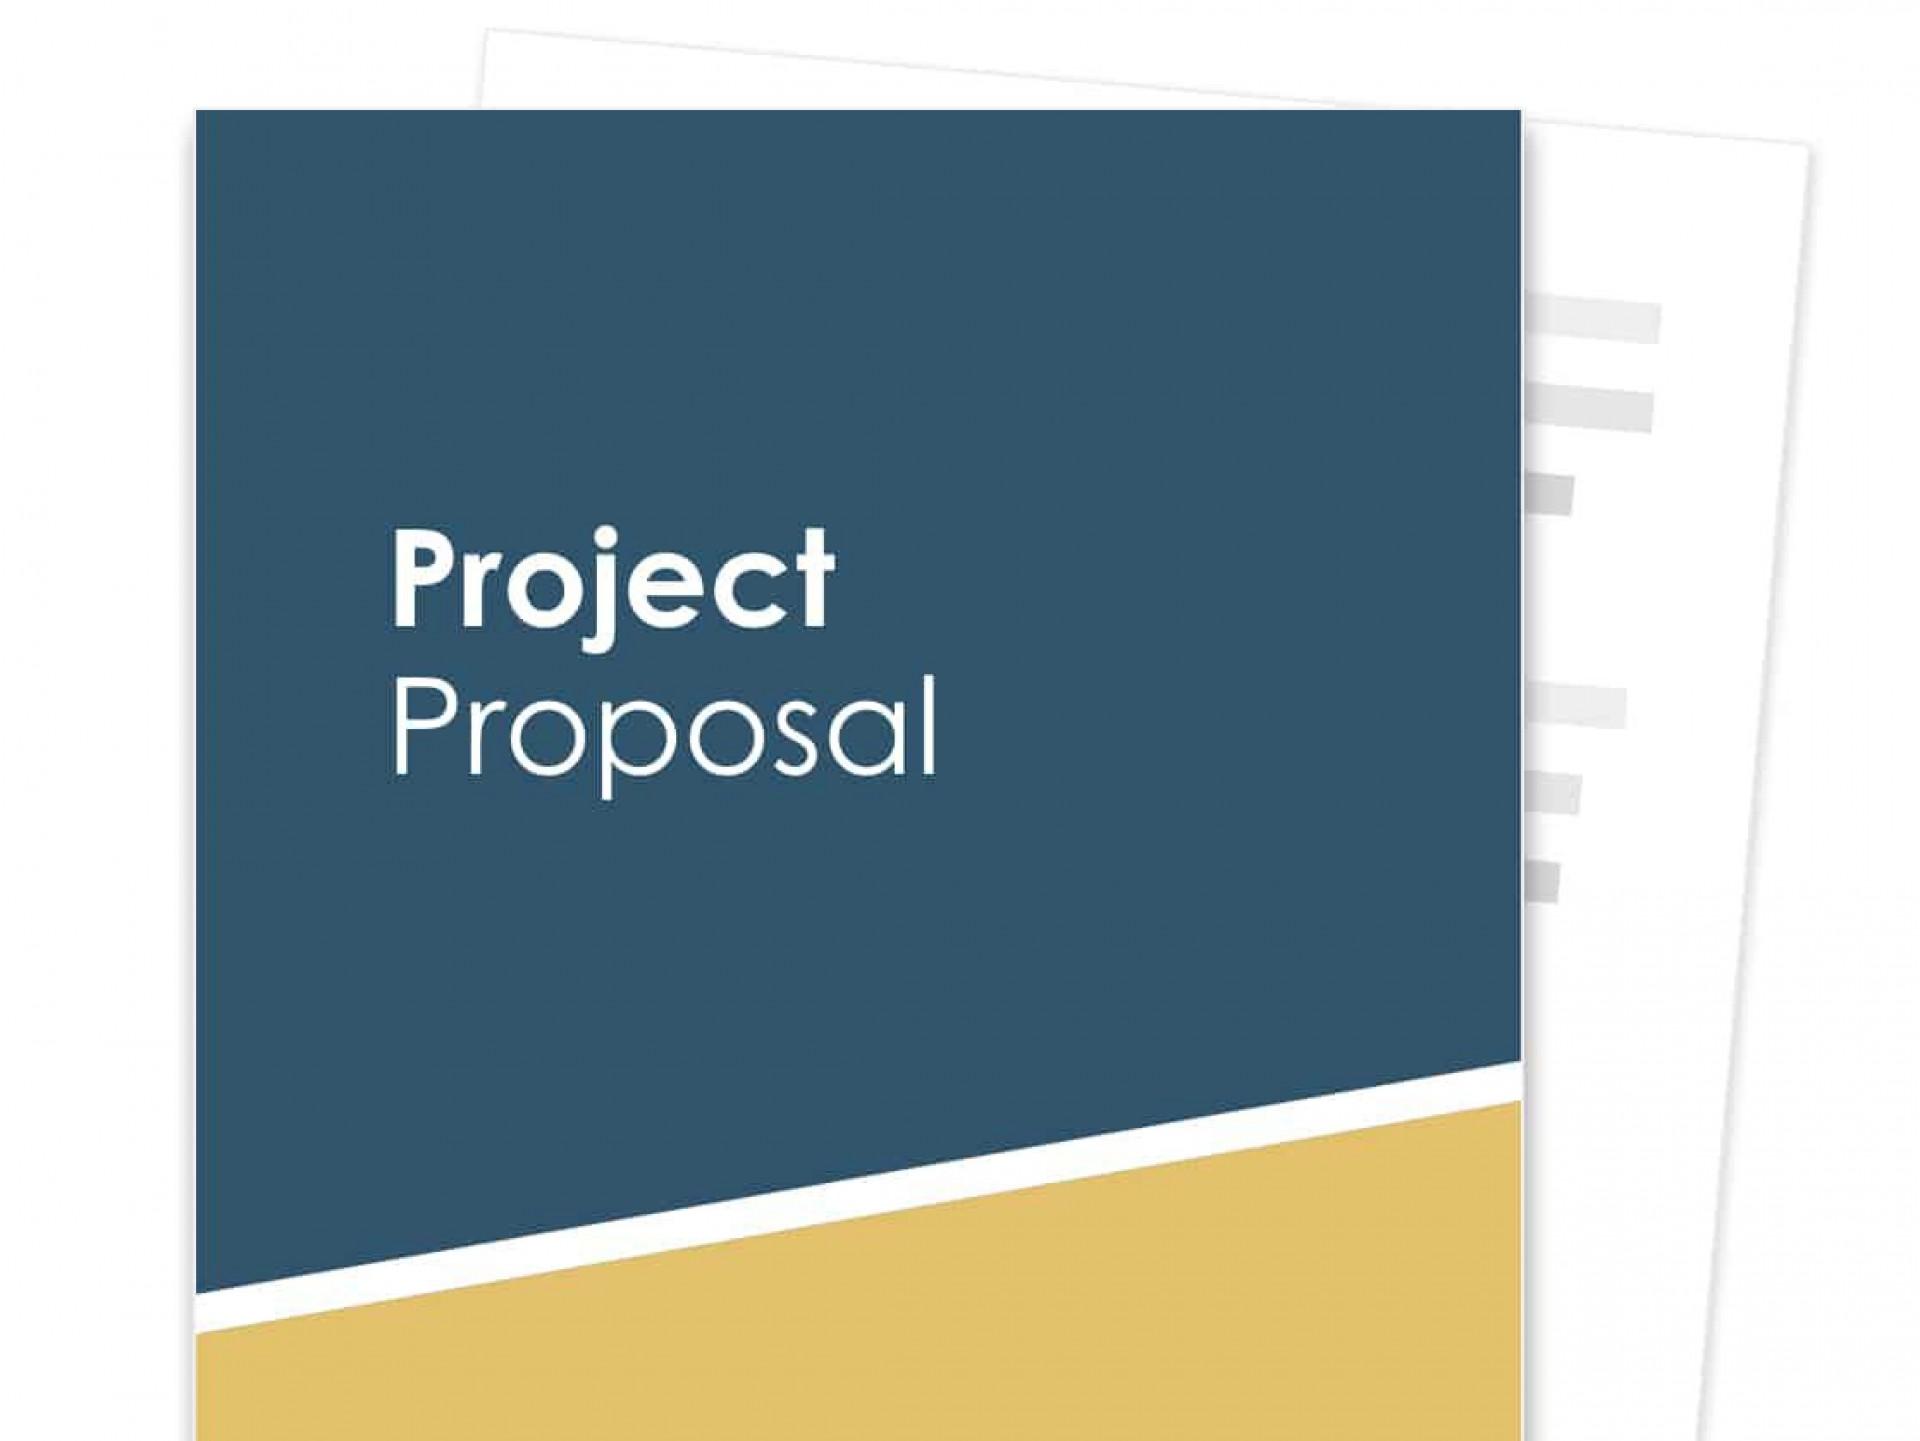 007 Fantastic Web Development Proposal Template Free Highest Quality 1920